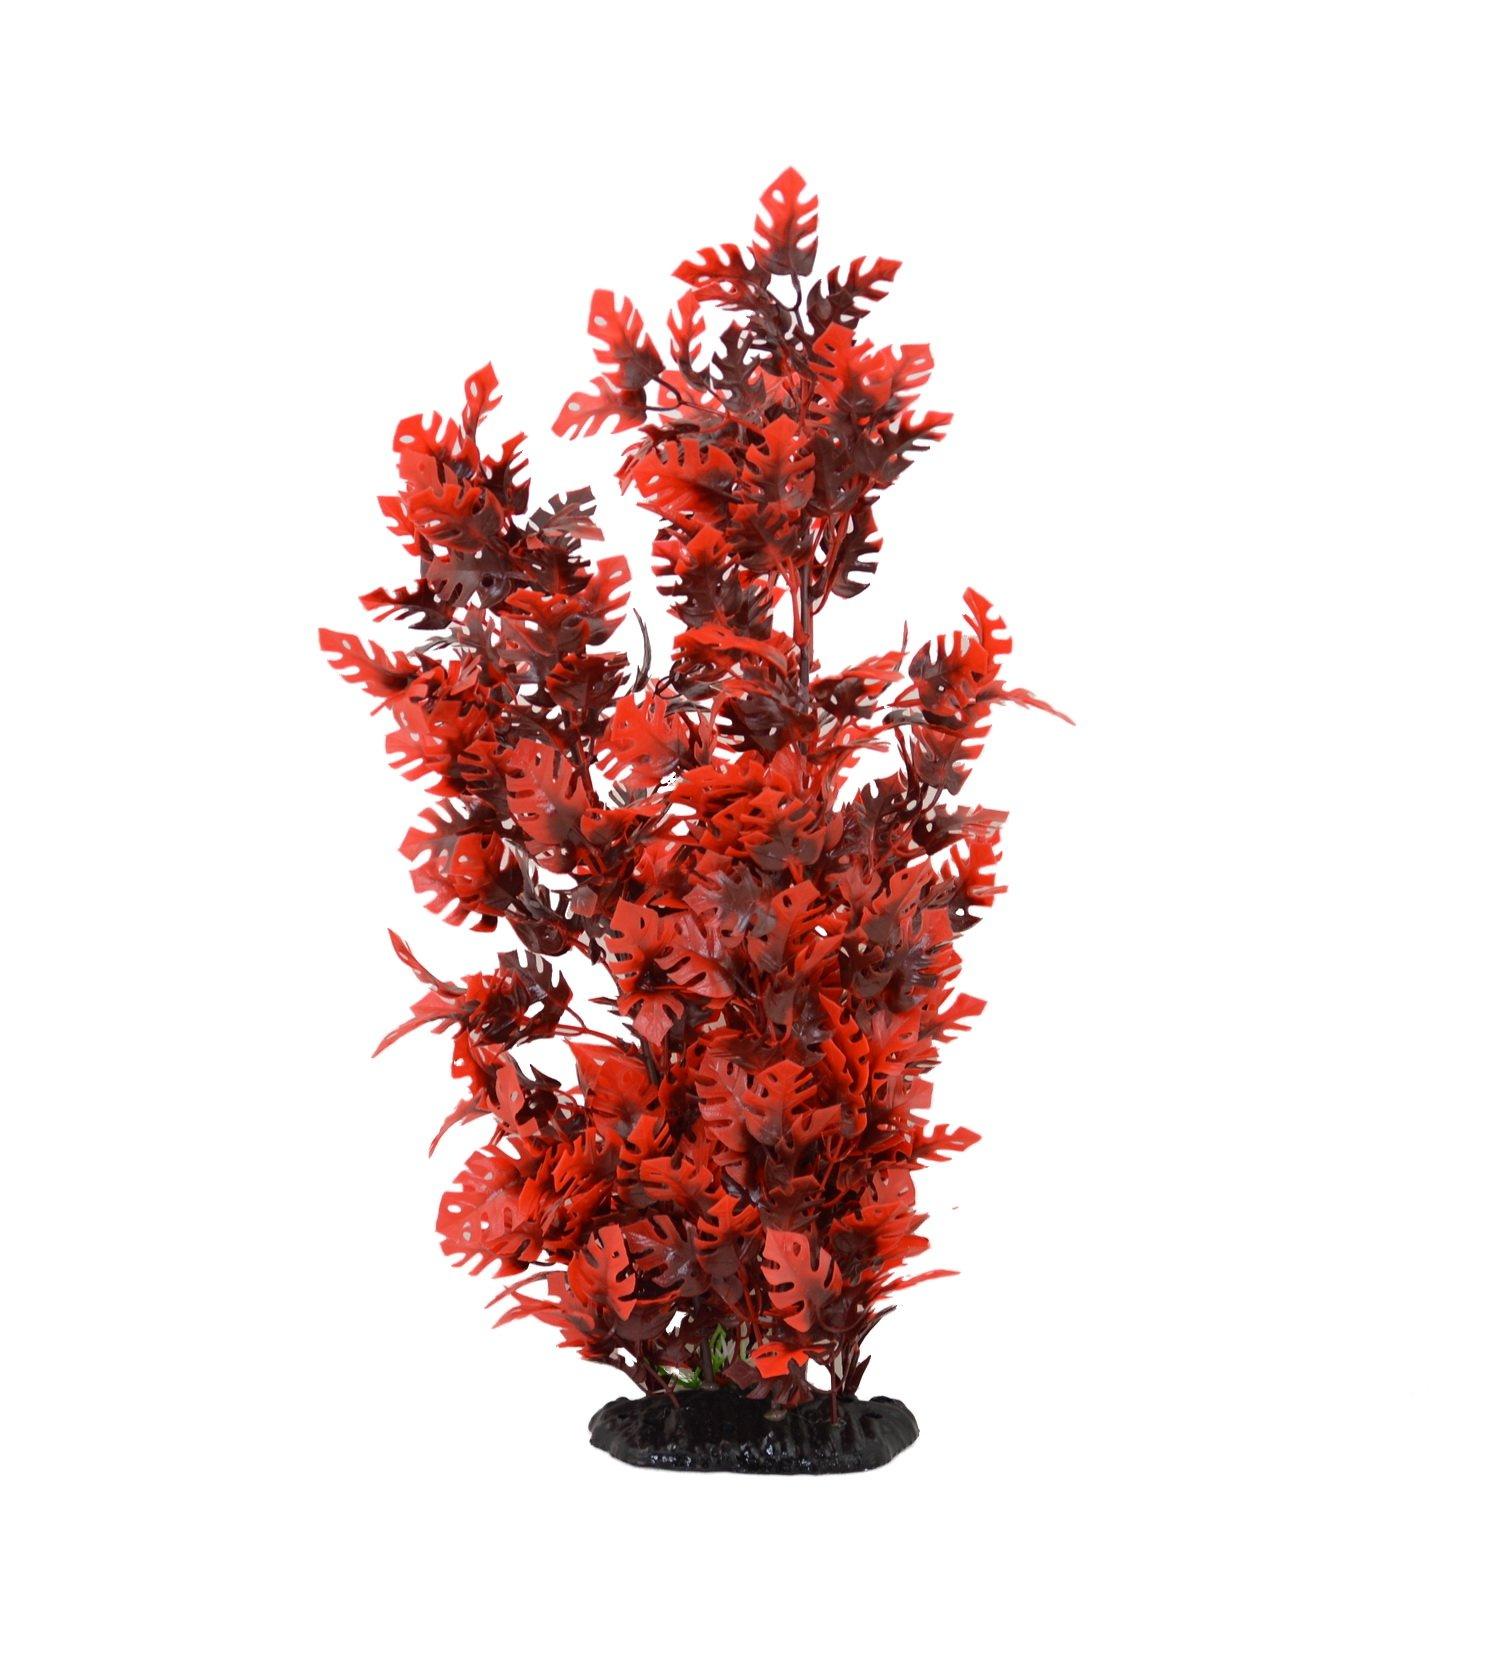 CNZ-Aquarium-Decor-Fish-Tank-Decoration-Ornament-Artificial-Plastic-Plant-Red-15-inch